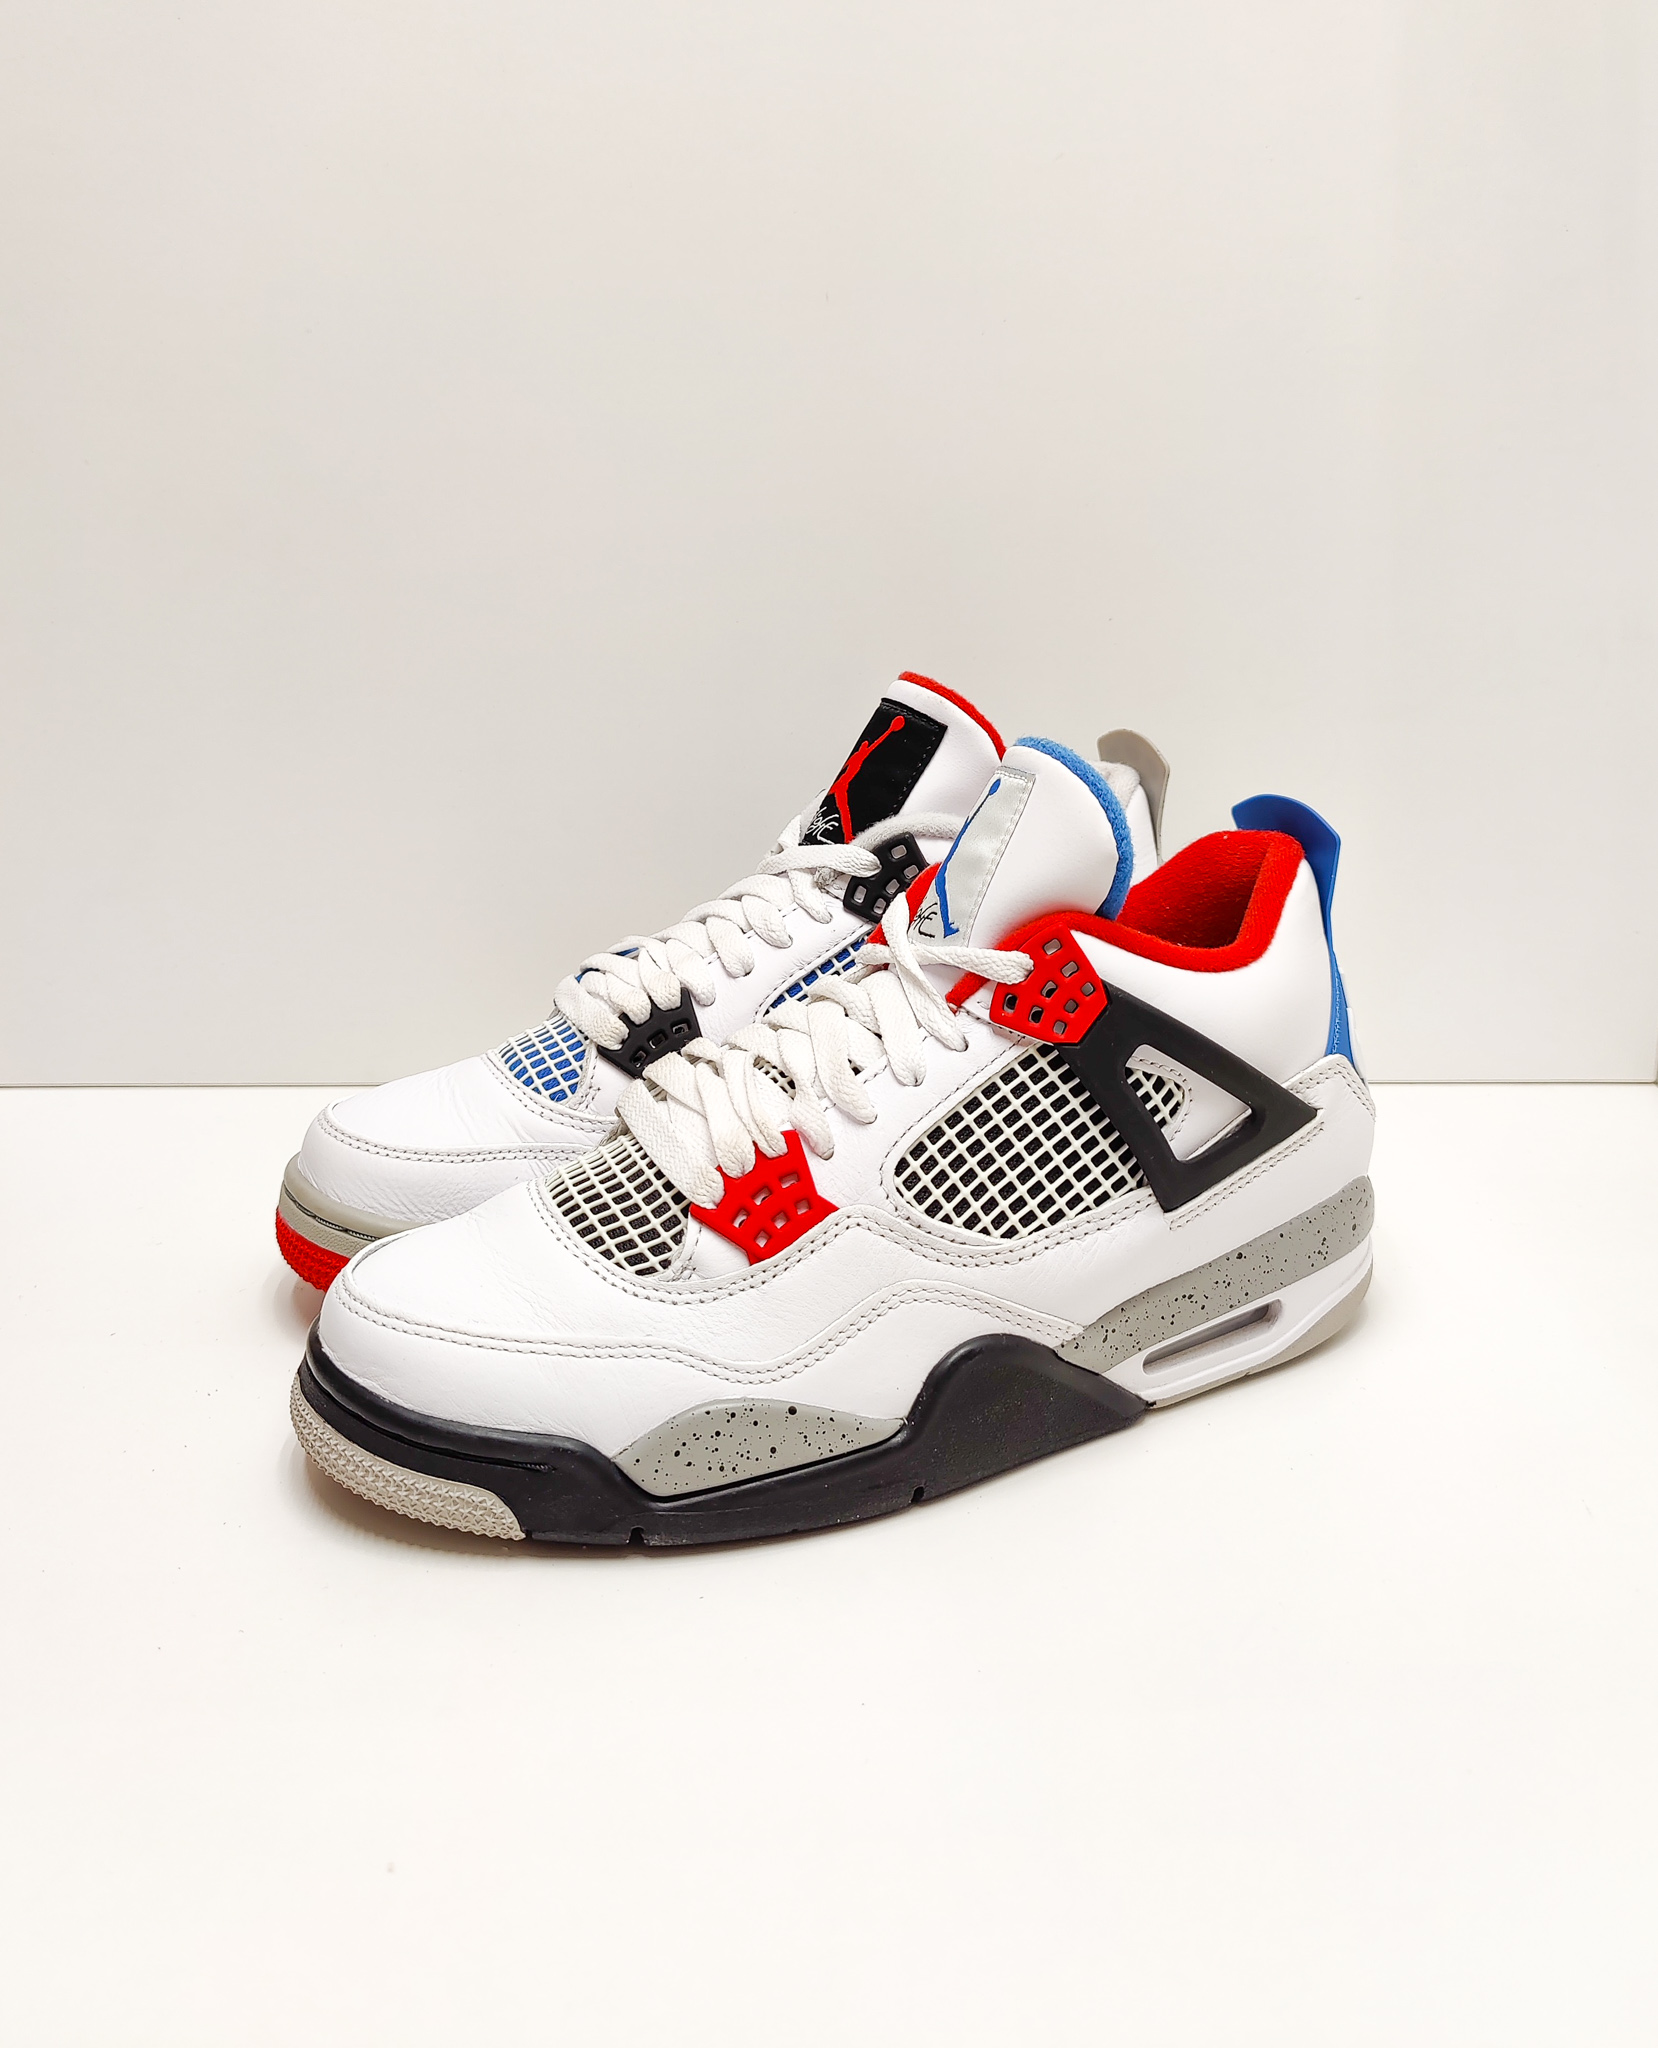 Jordan 4 Retro What The